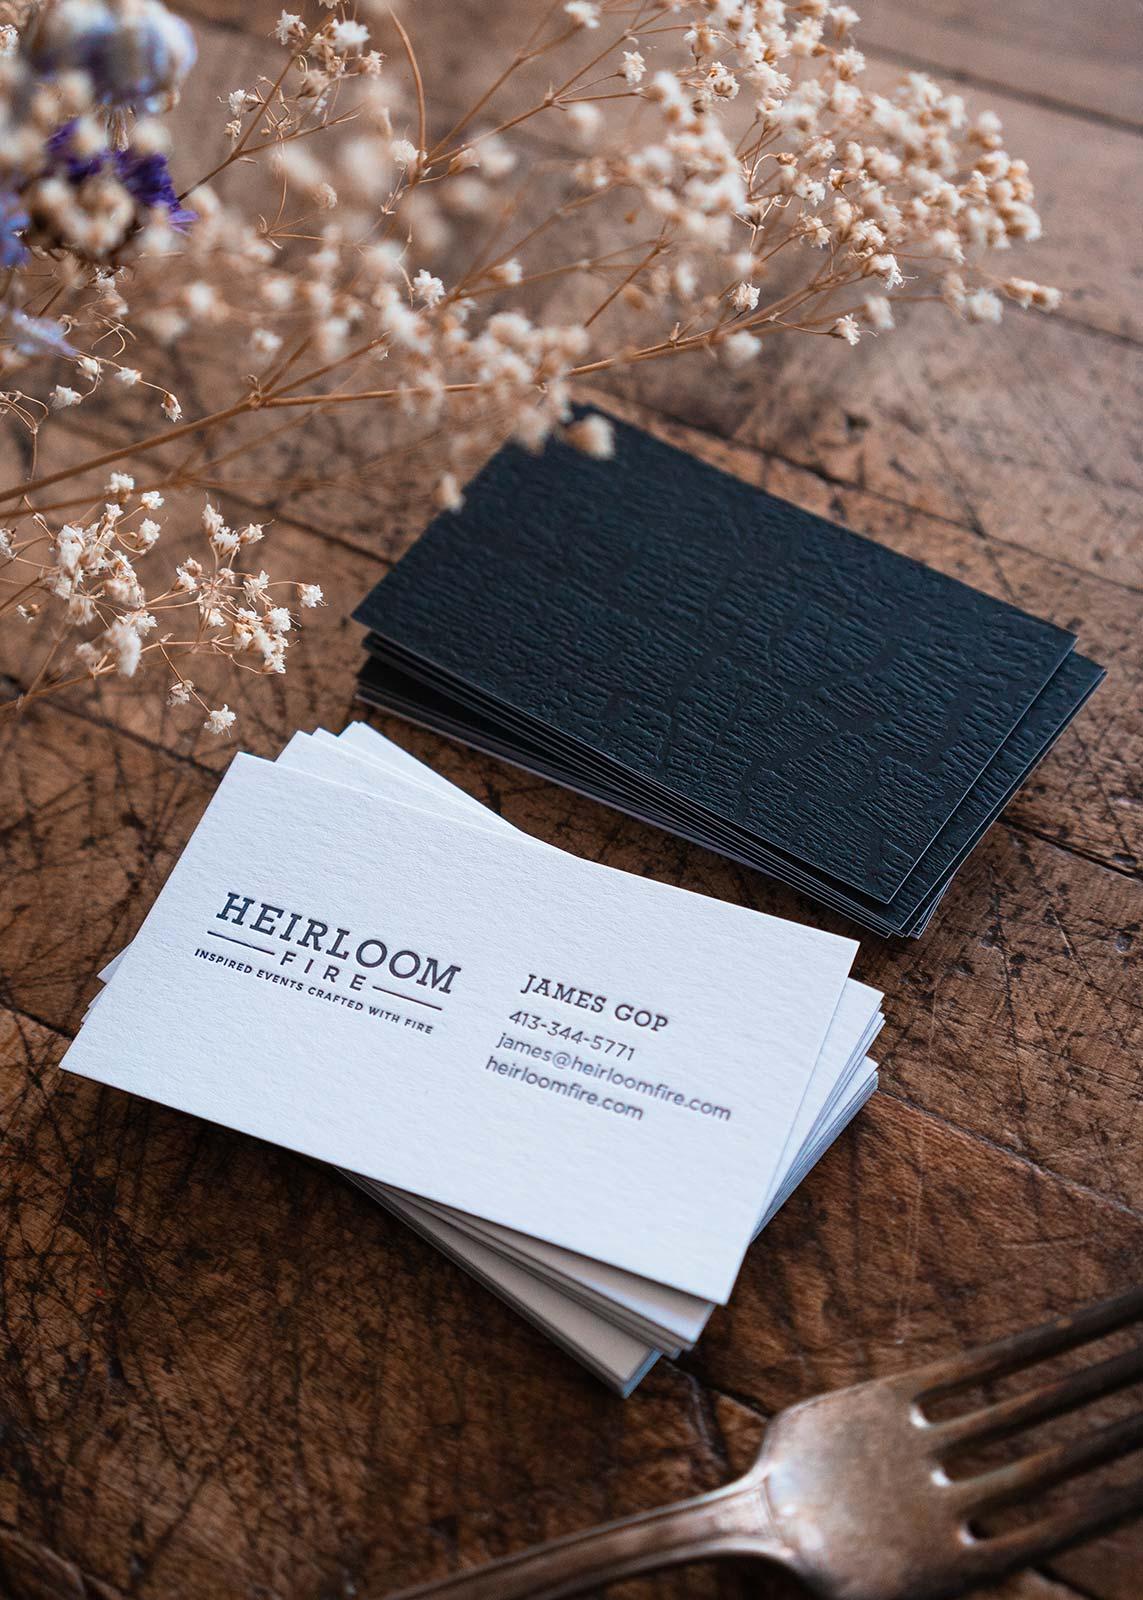 Heirloom Fire business card letterpress design